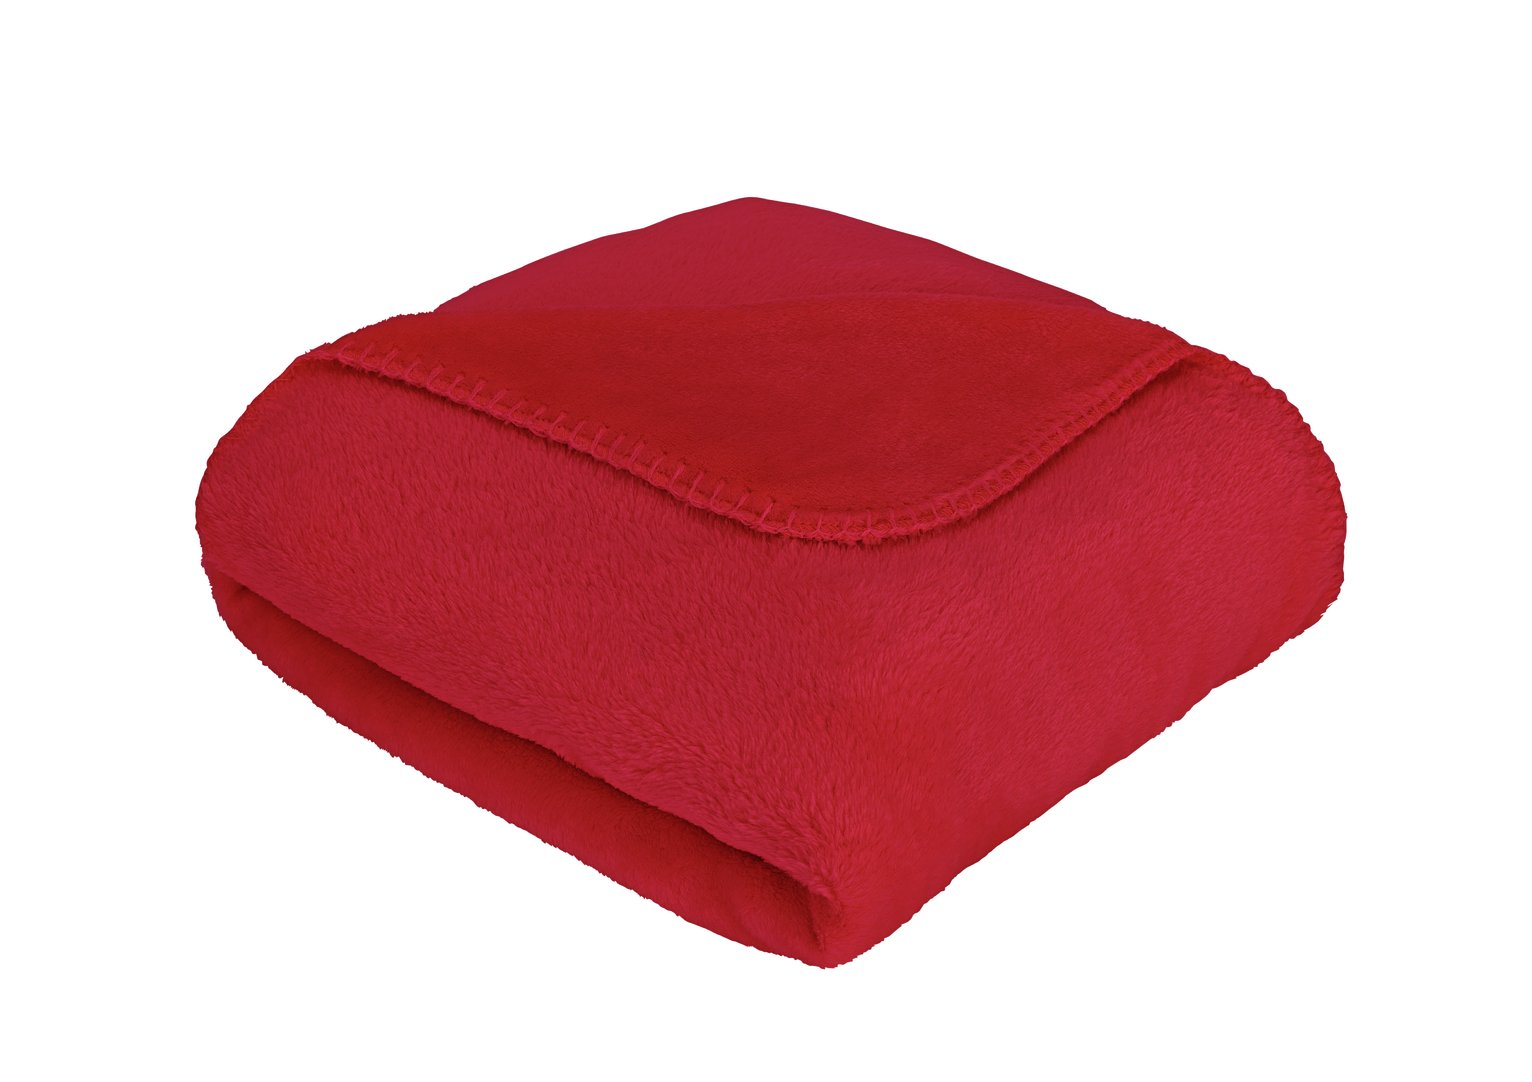 Argos Home Supersoft Fleece Throw - Red